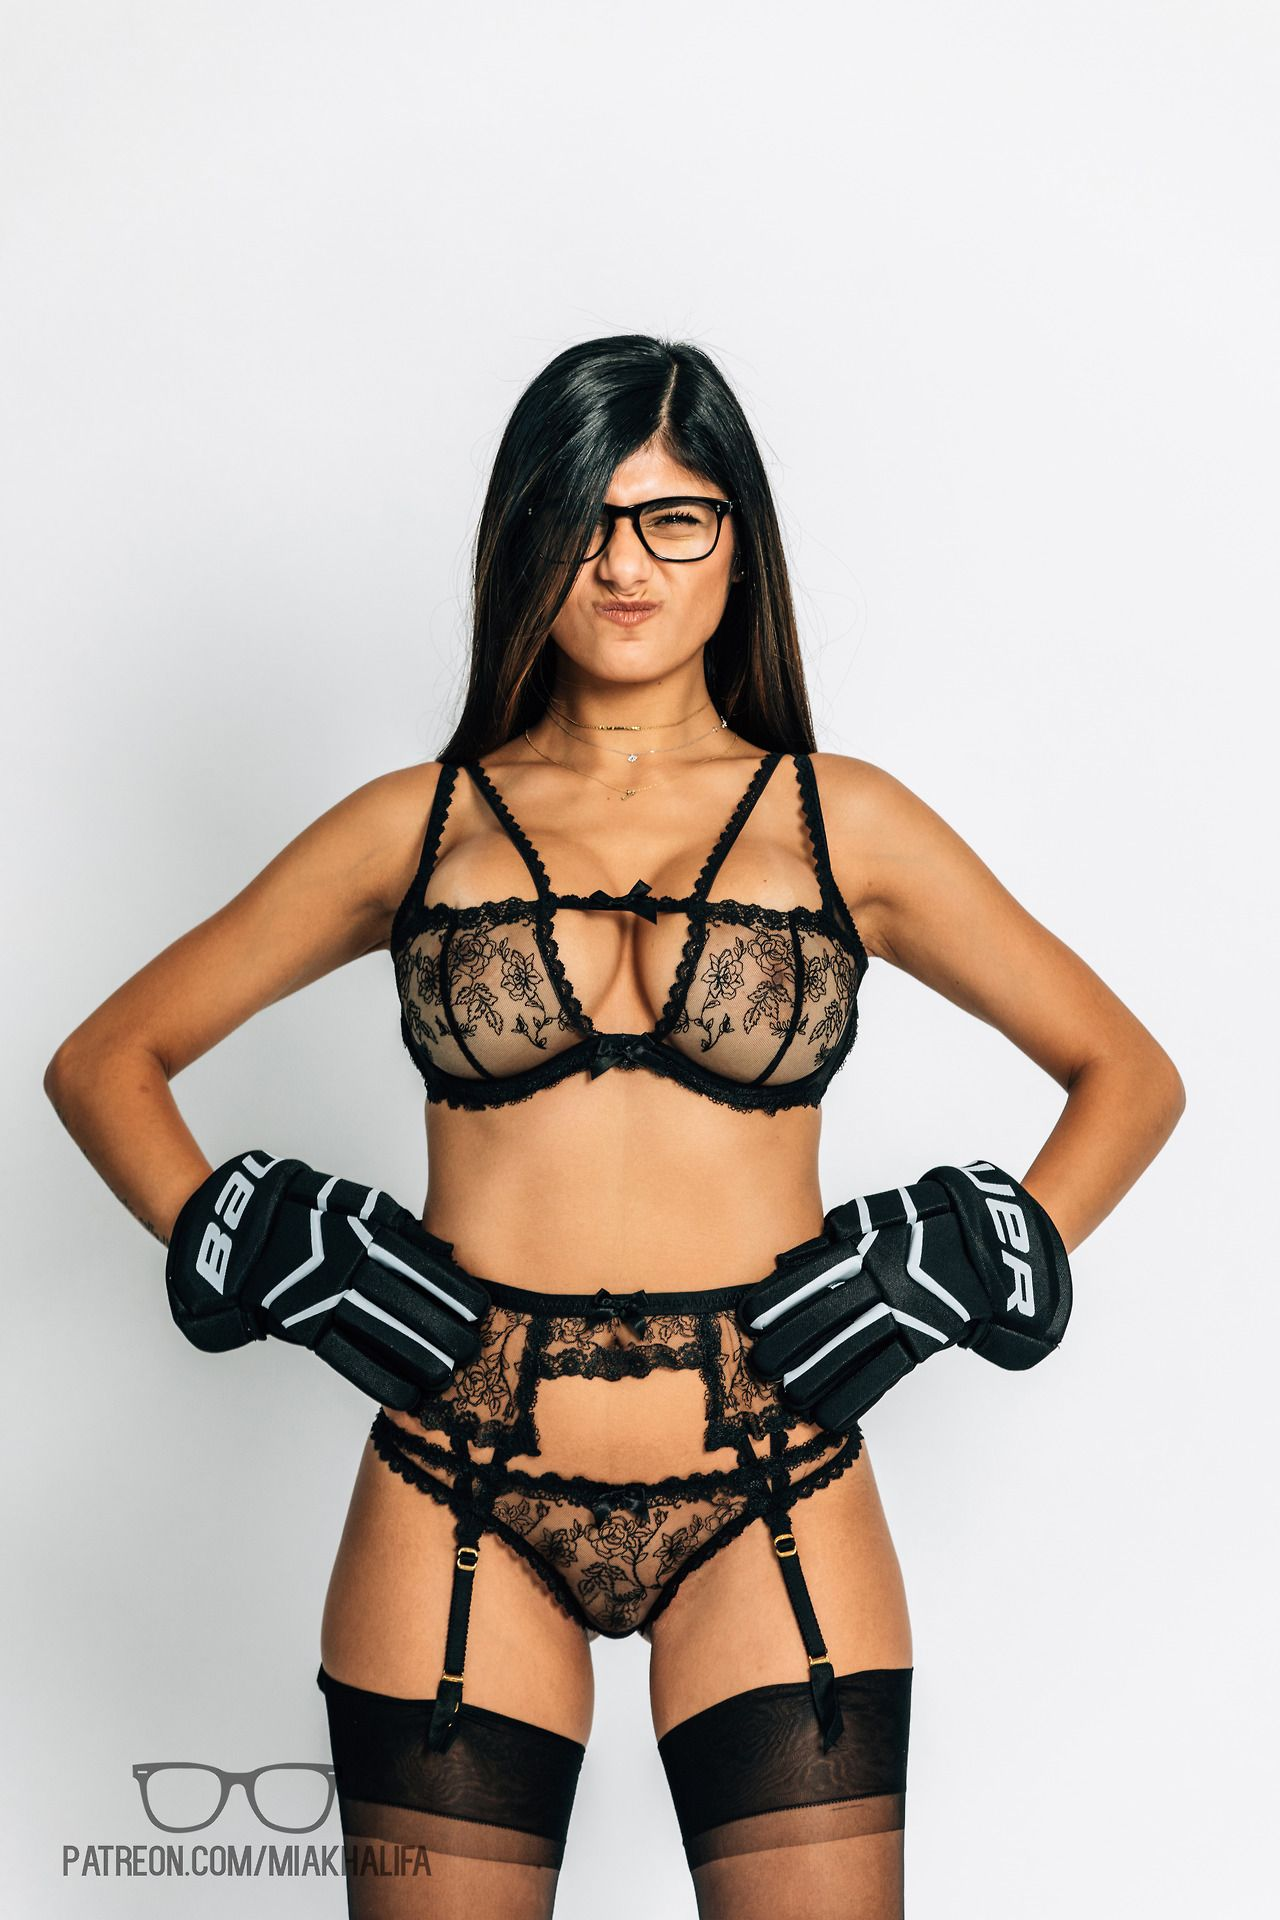 Mia Khalifa Patreon 1